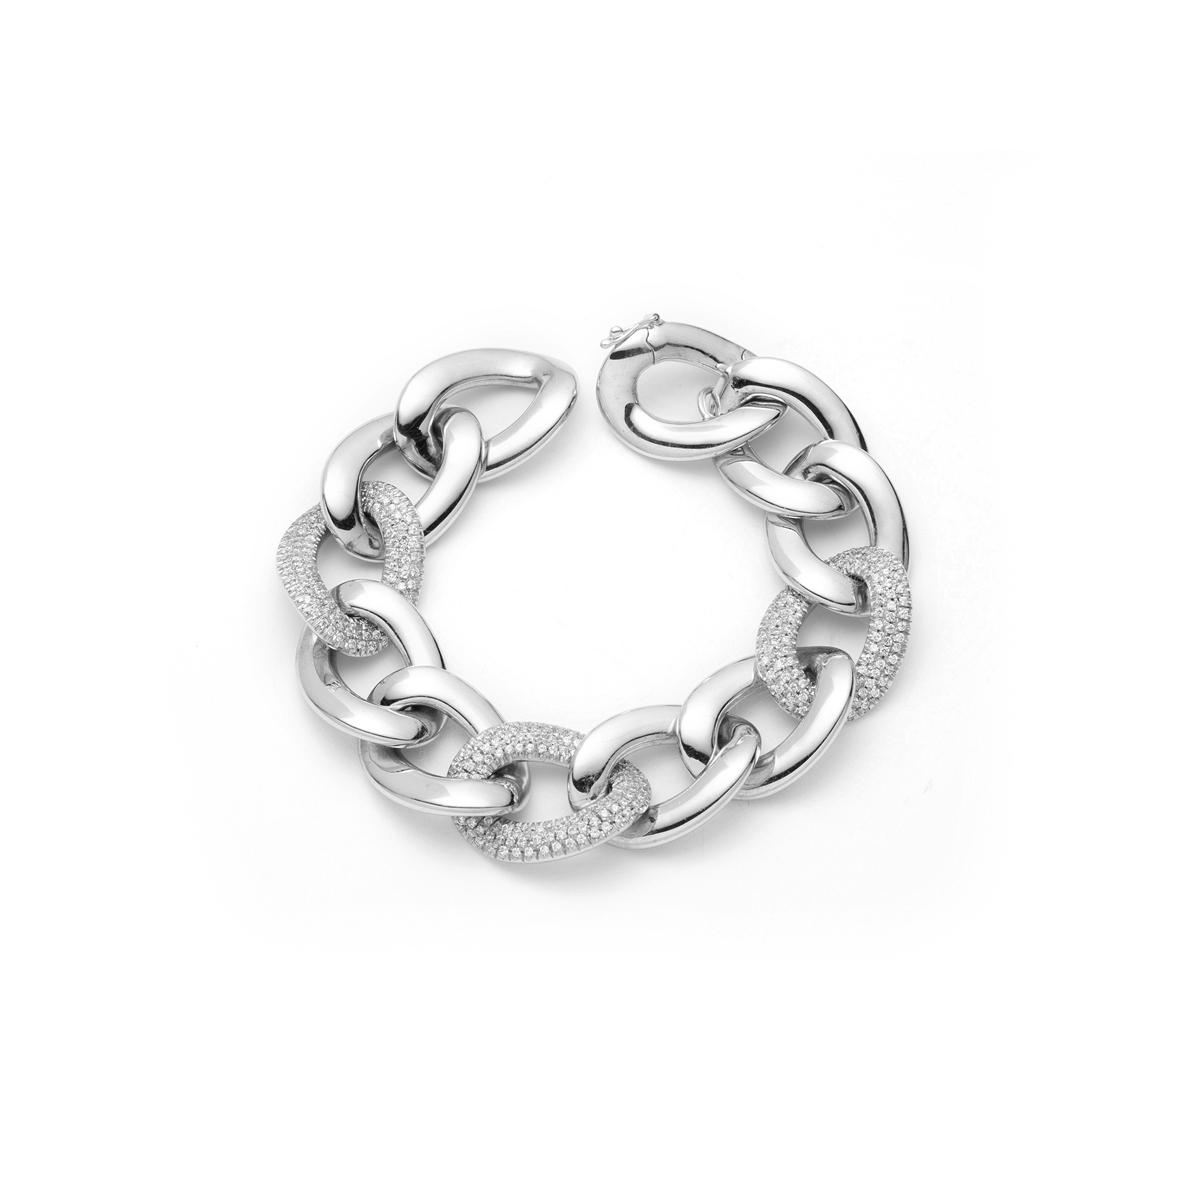 Diamond Interlocking Link Bracelet in Silver